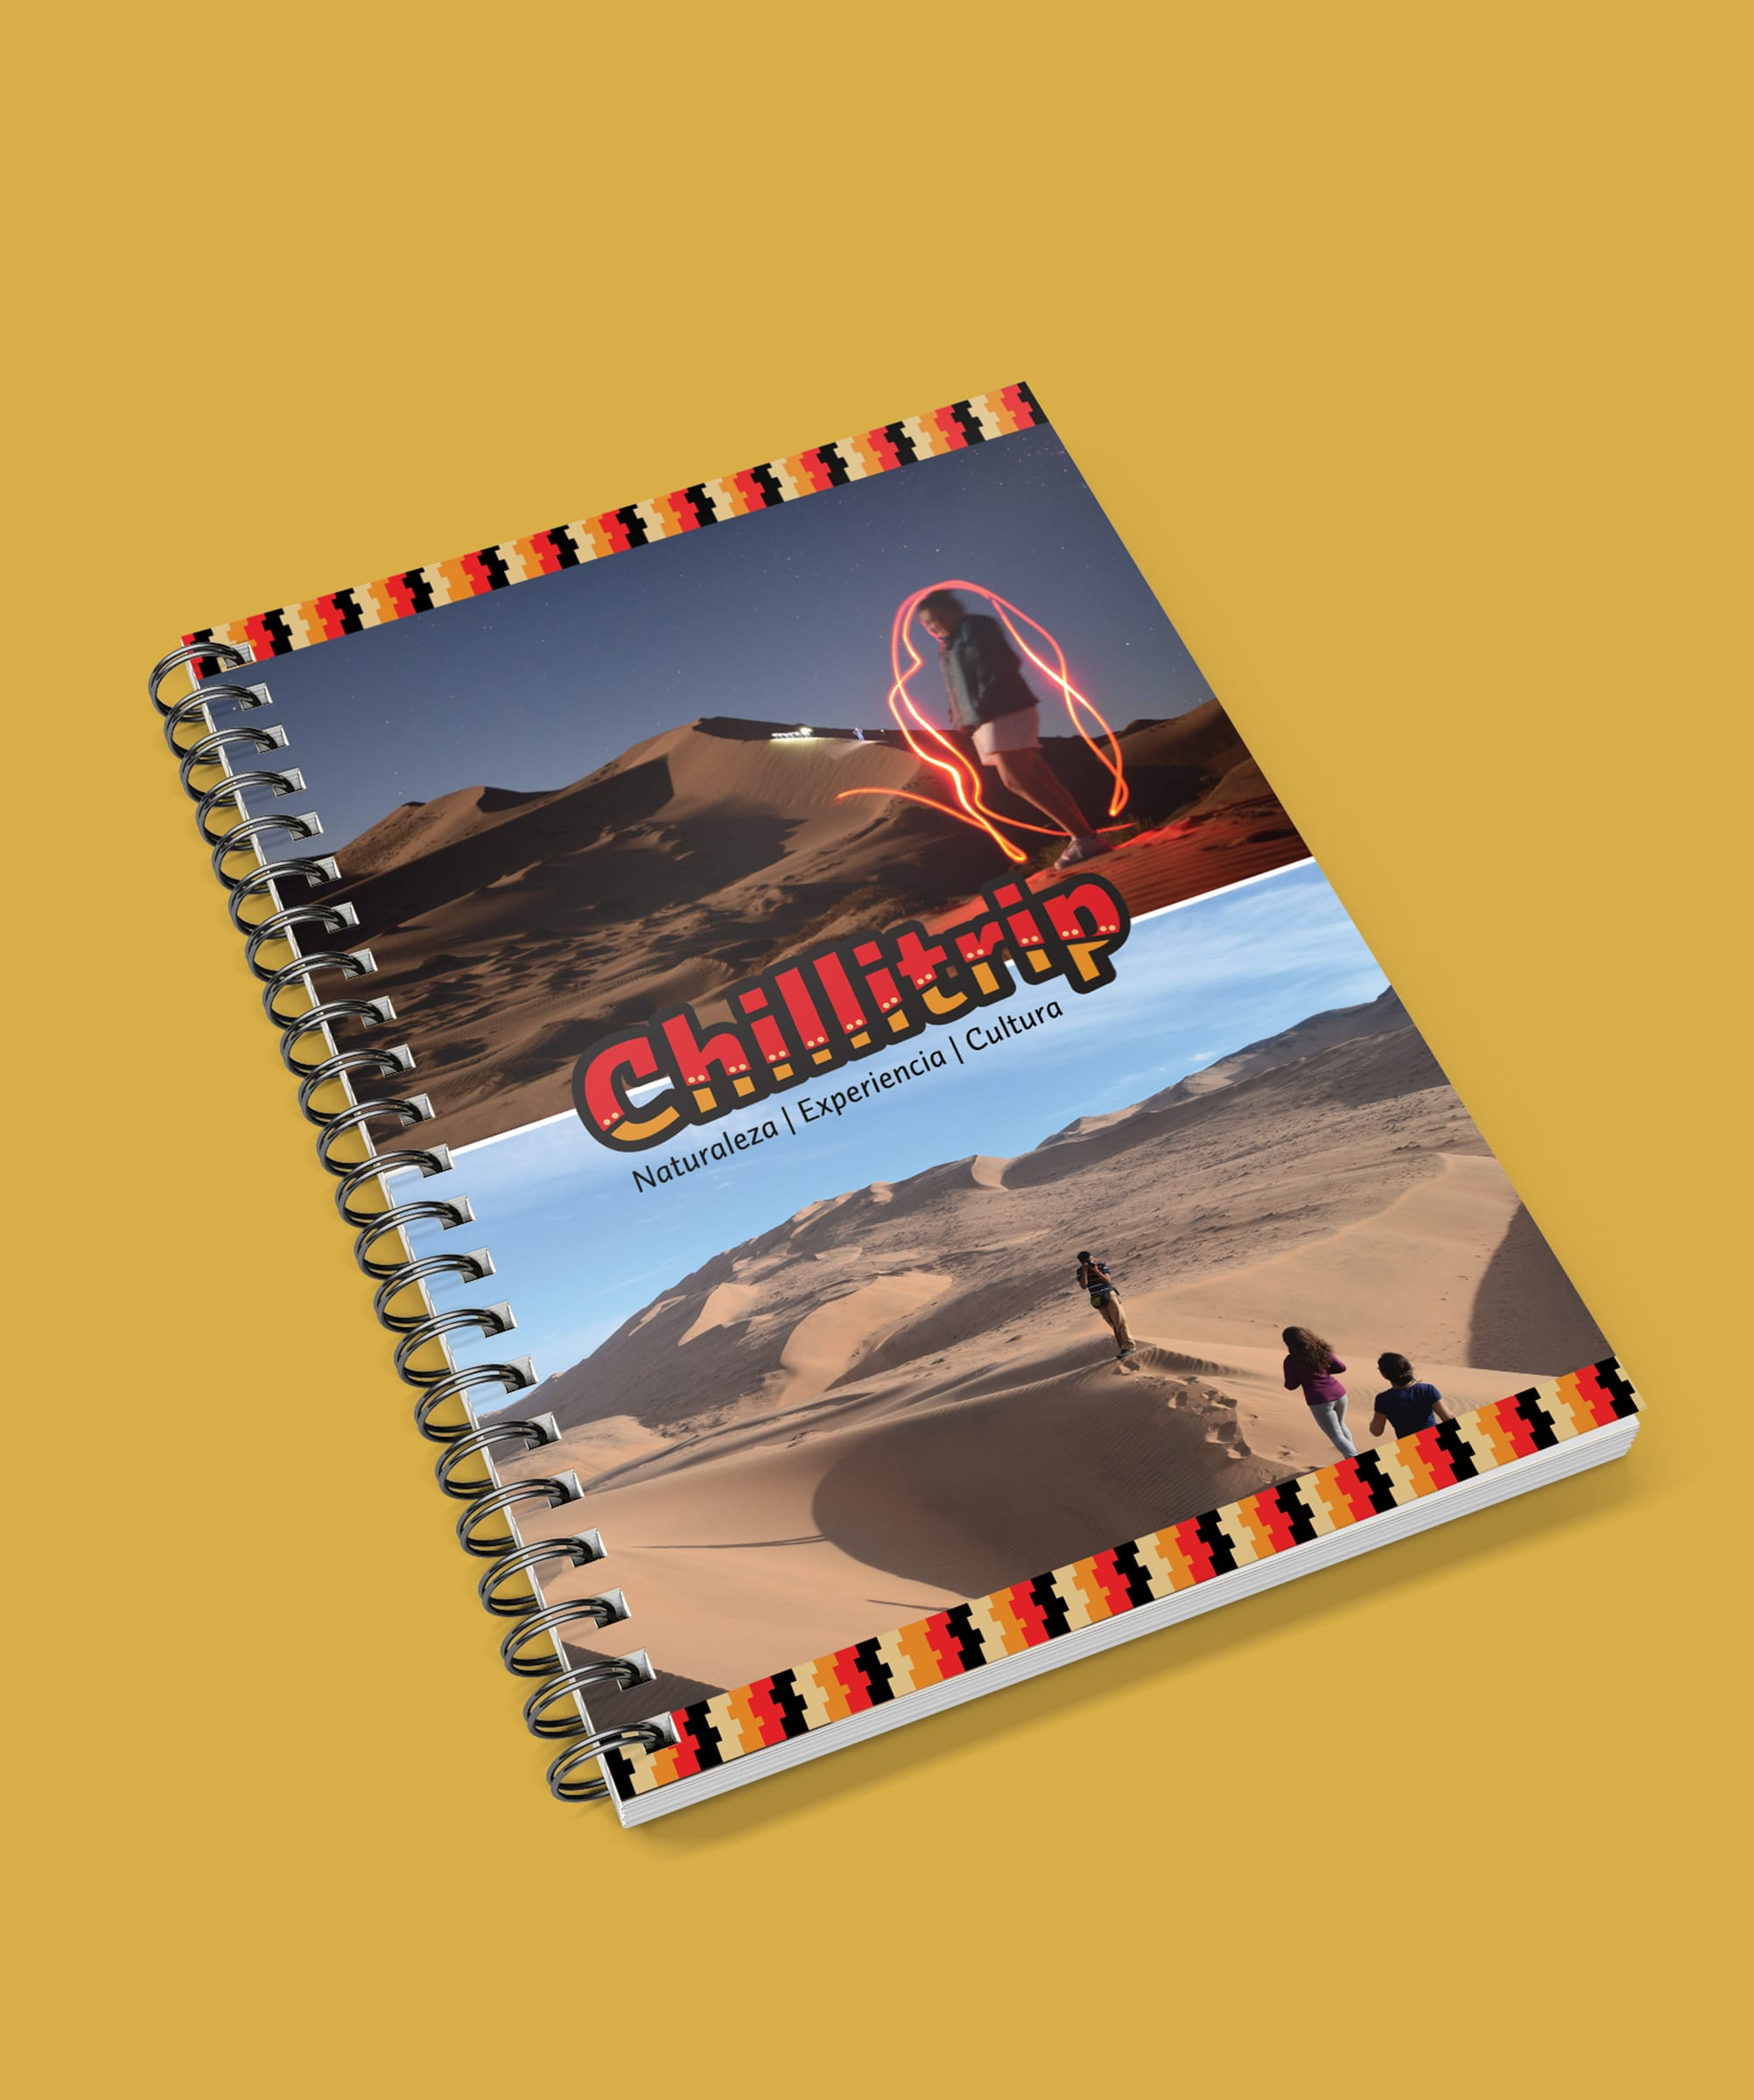 Cuaderno Chillitrip